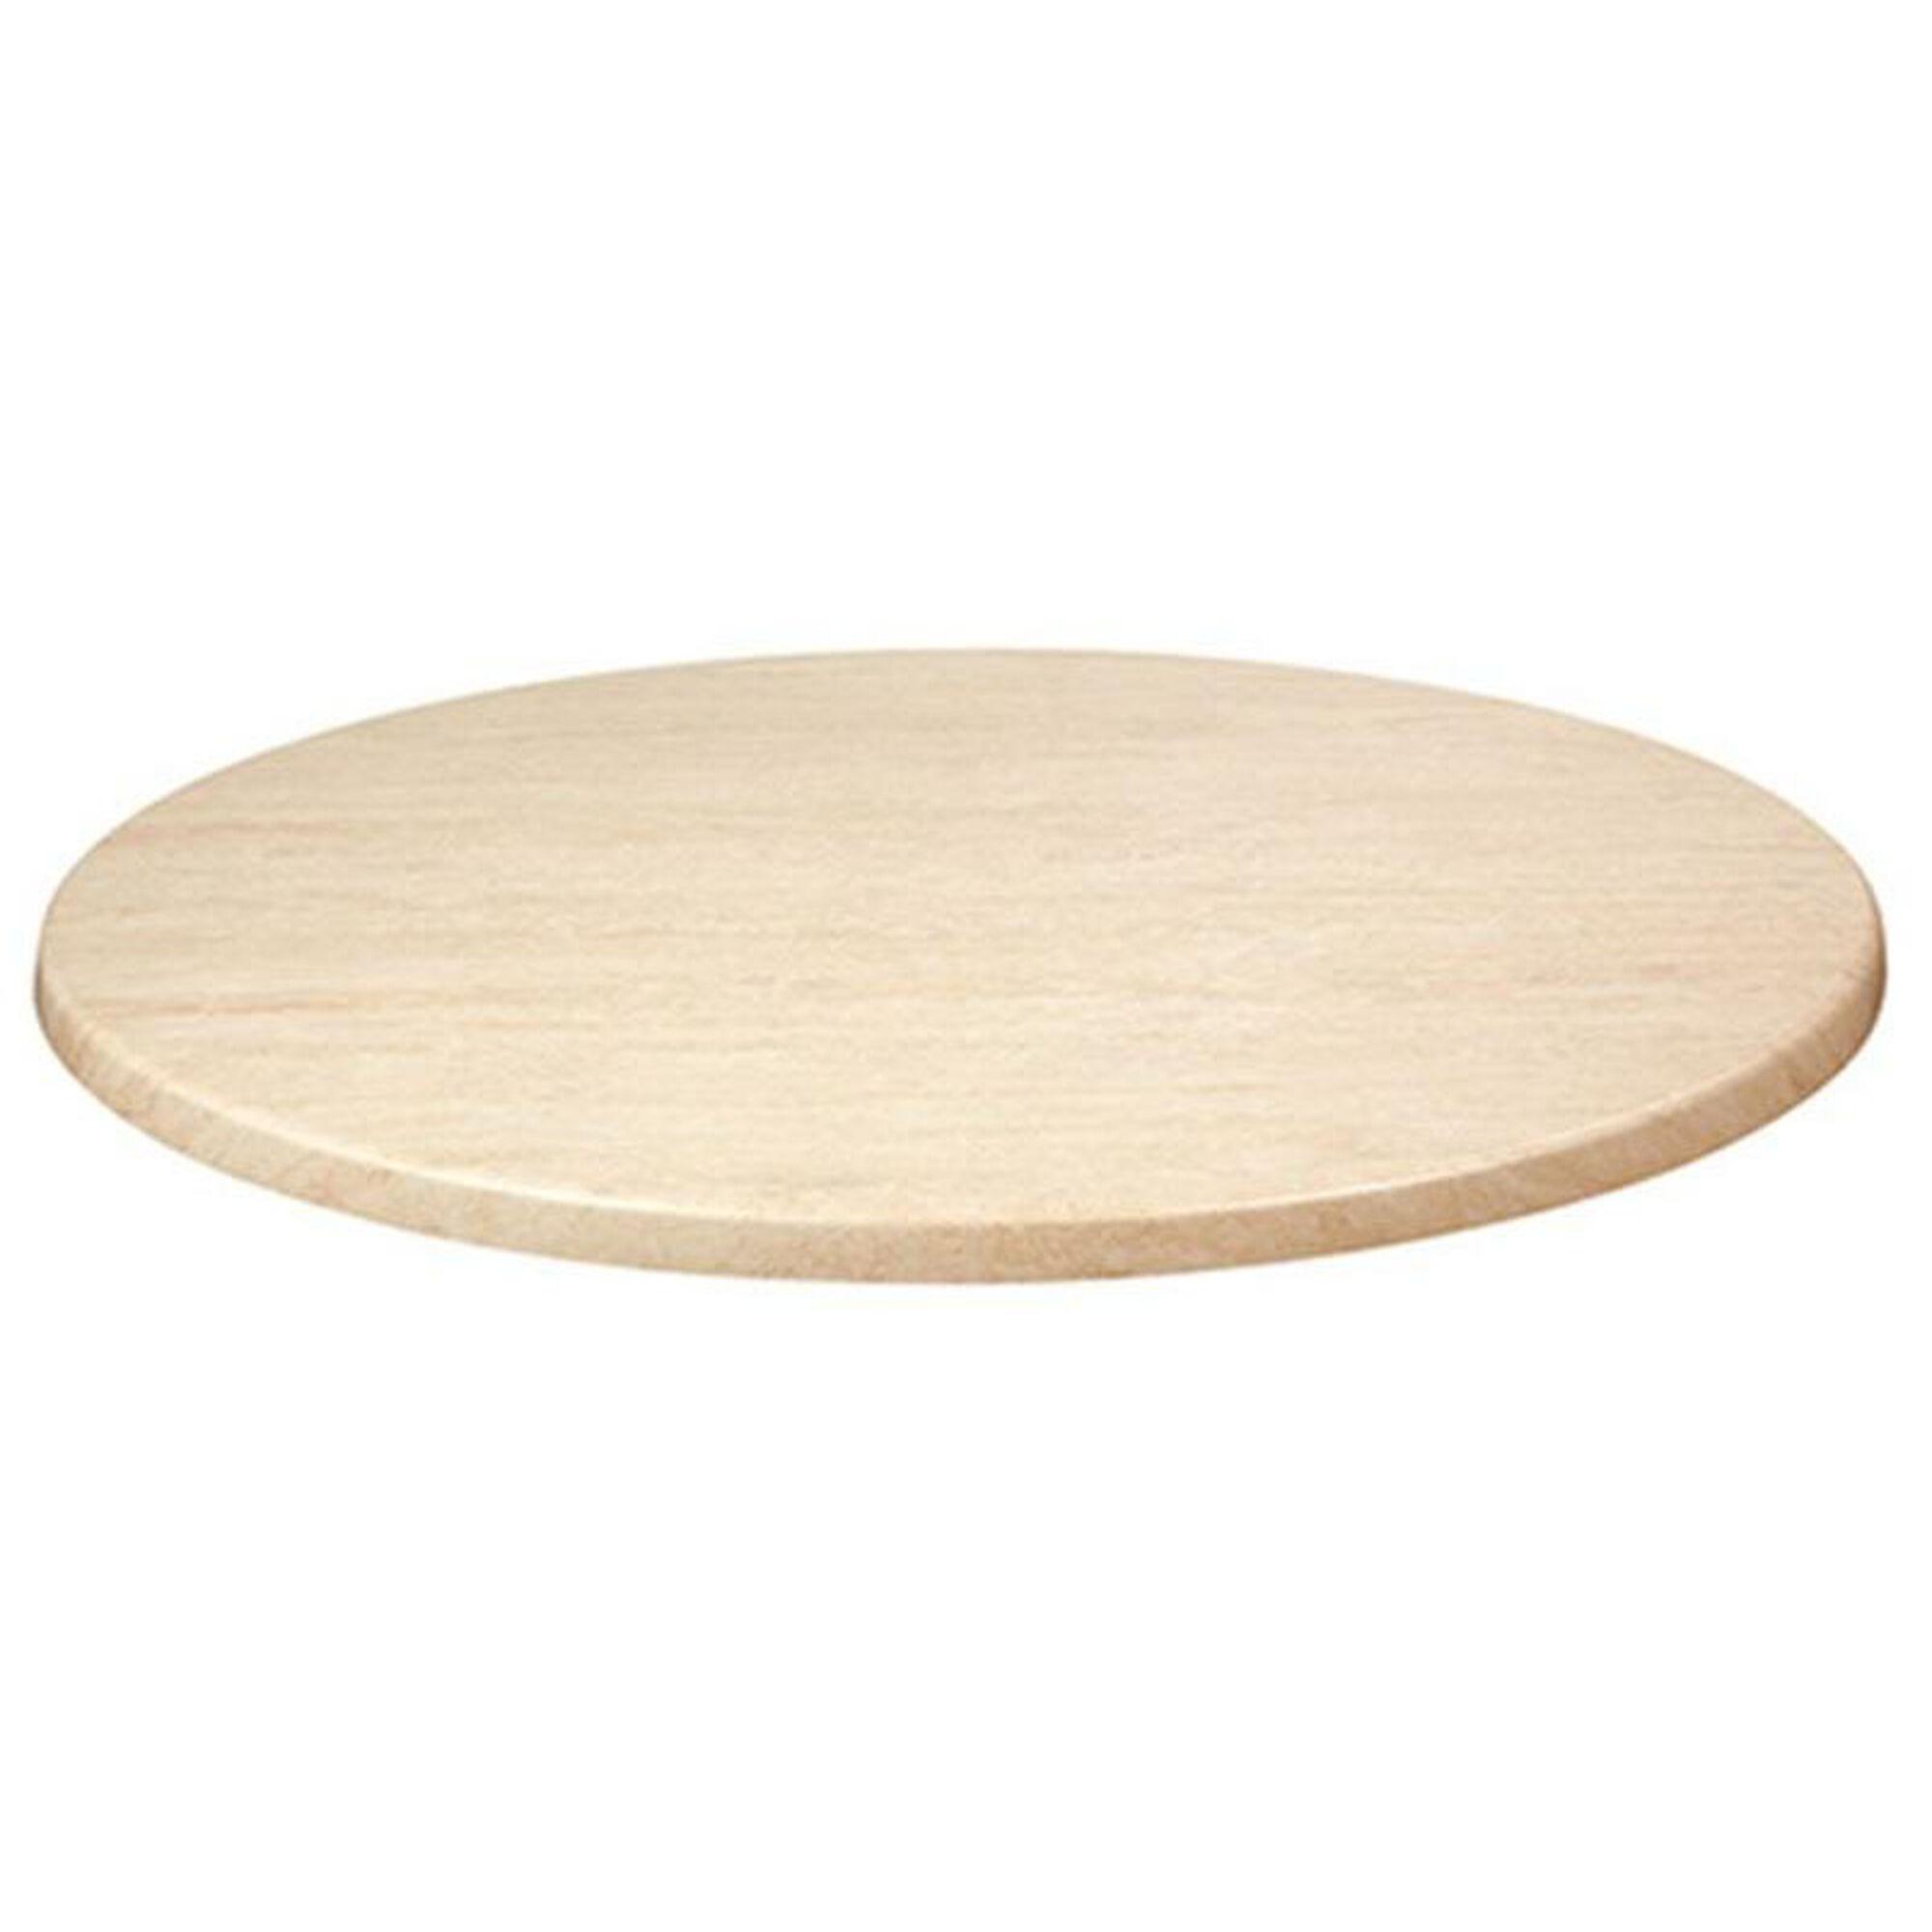 Round Table Top 36 Rnd Travertine